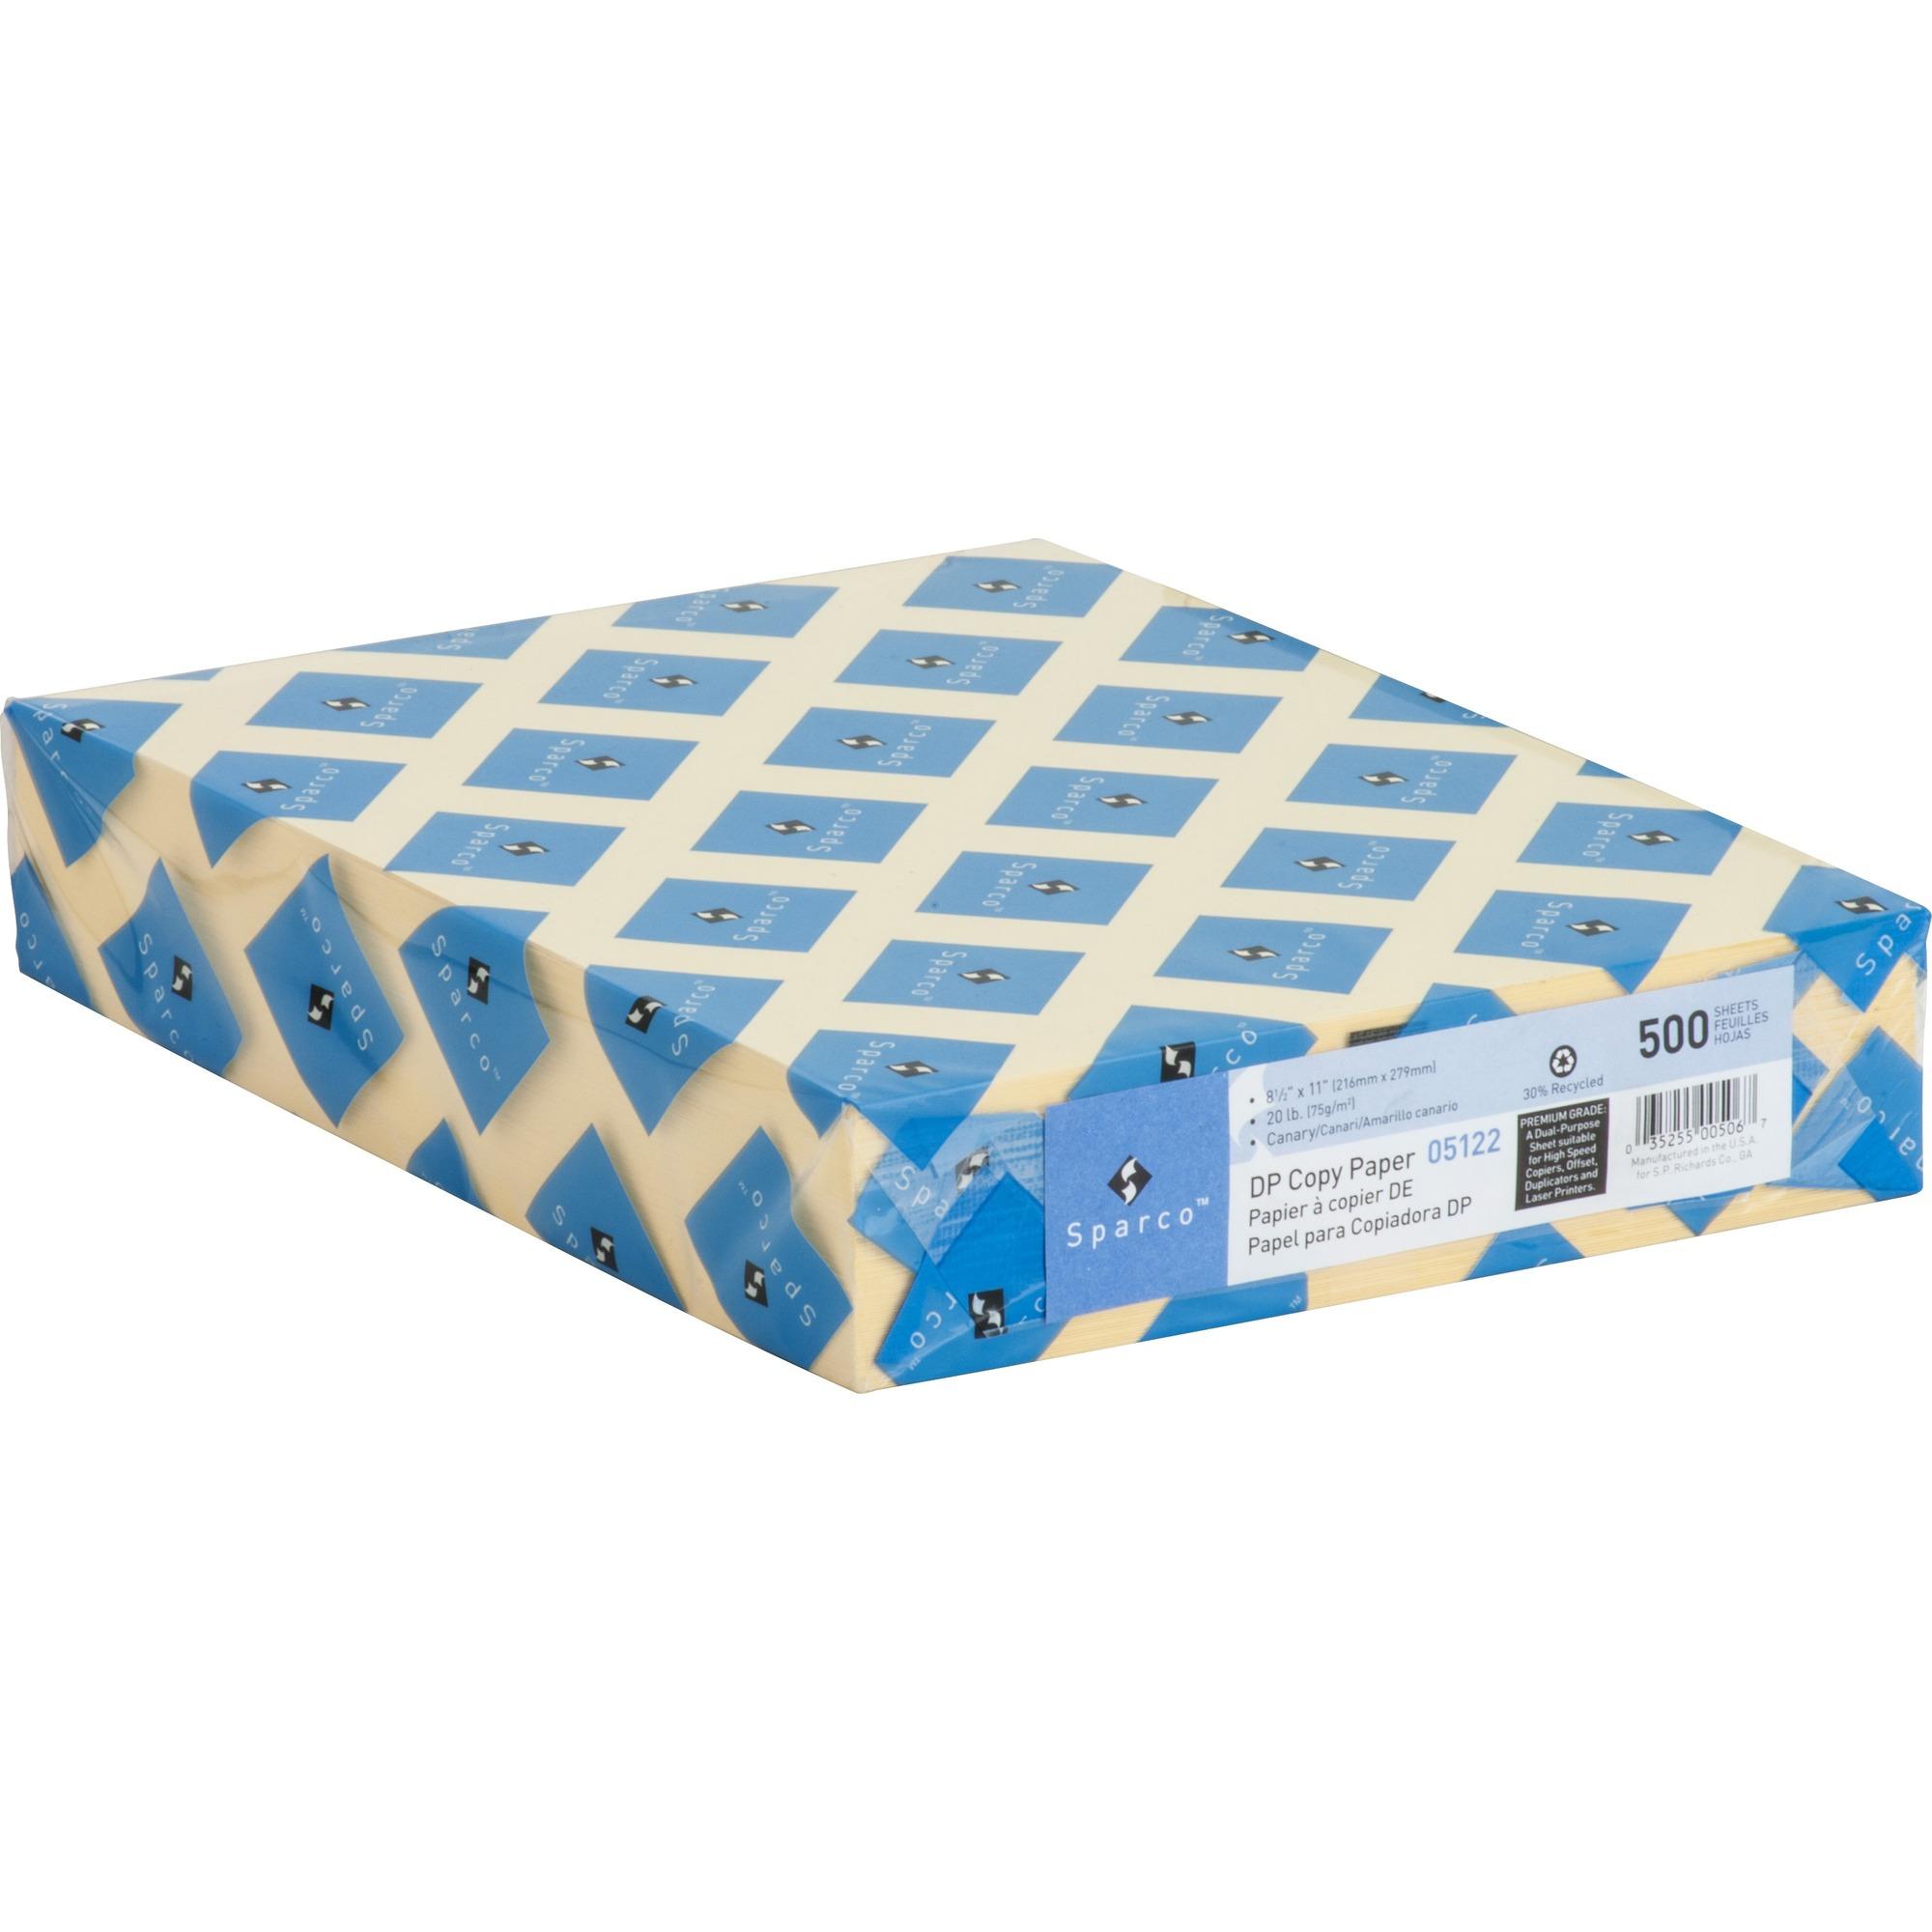 Sparco Premium Grade Pastel Color Copy Paper, Canary, 500 Sheets